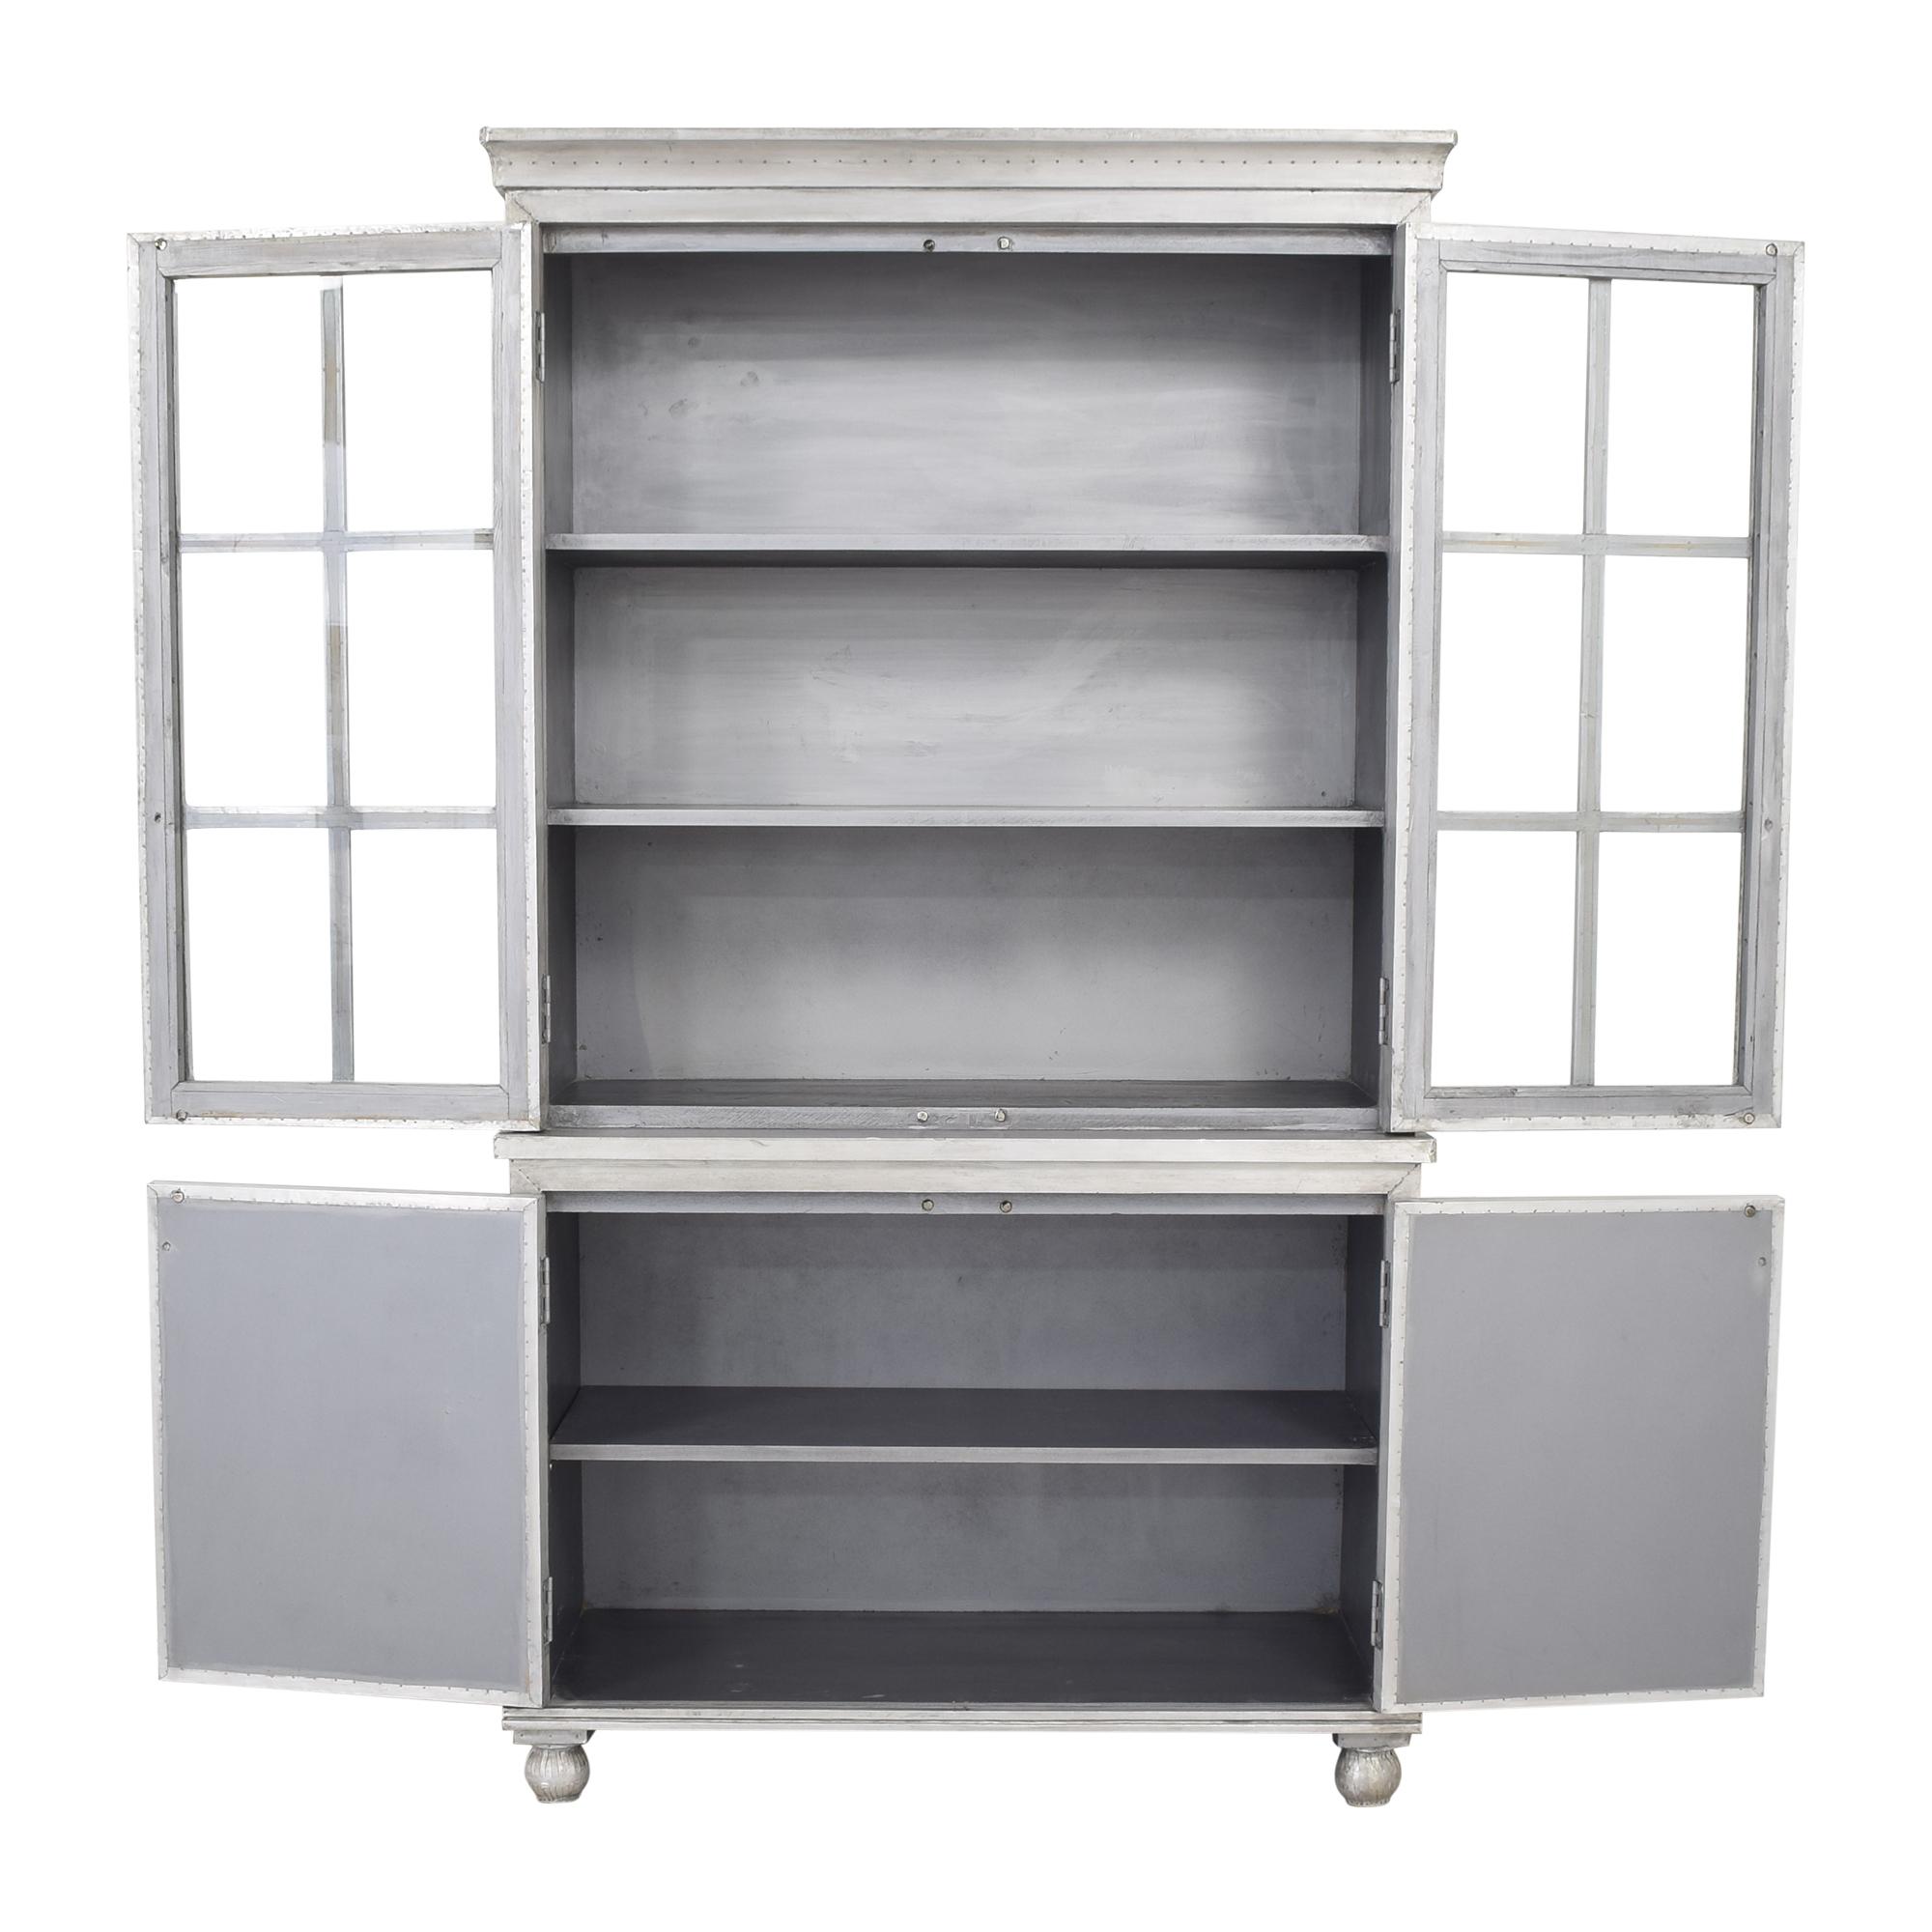 Restoration Hardware Annecy Double-Door Sideboard & Hutch sale